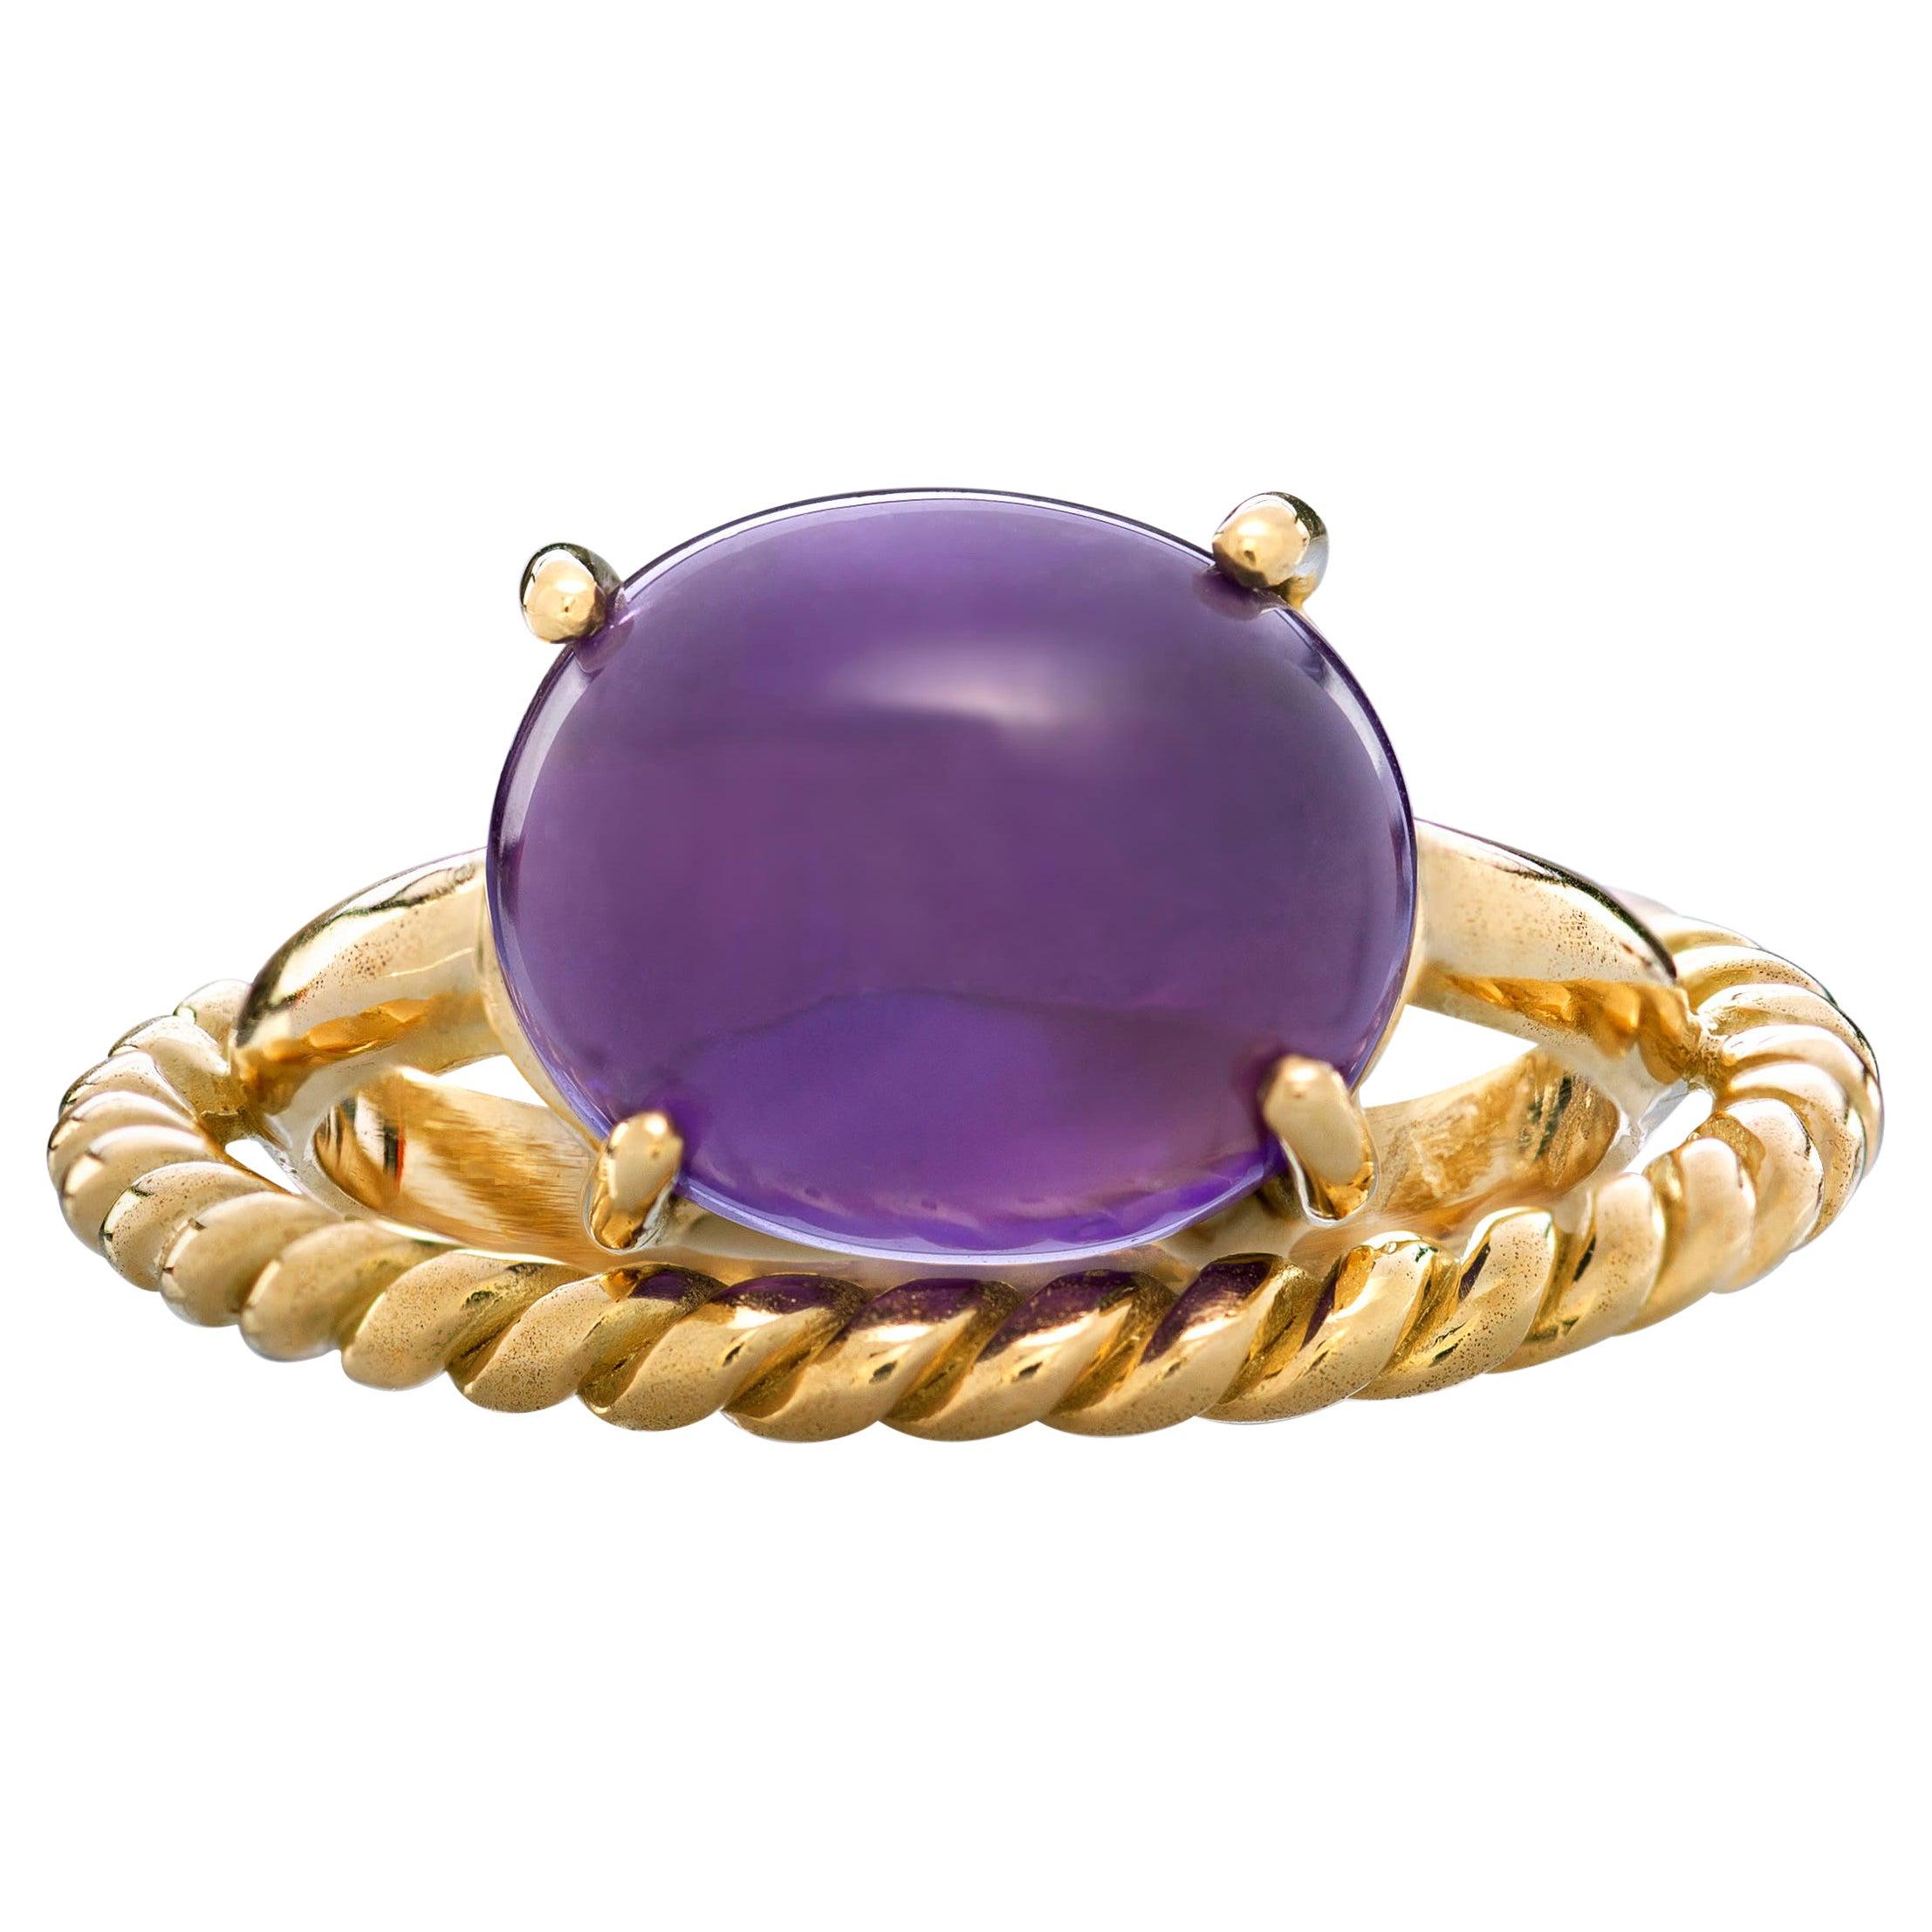 Modern 18 Karat Yellow Gold Twist Love Amethyst Handcrafted Design Ring